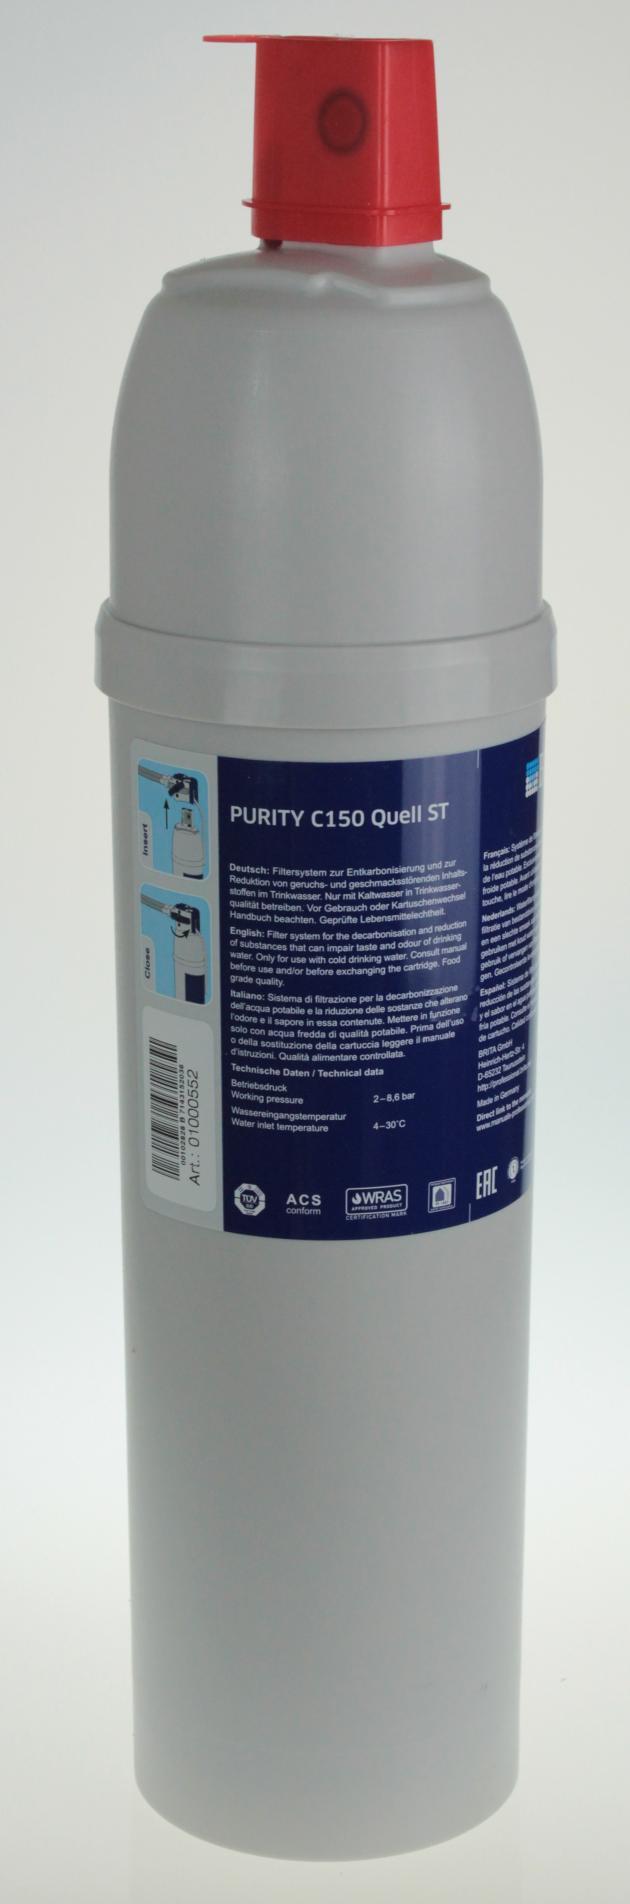 Brita Purity C150 Quell ST Wasserfilter - Filterkartusche